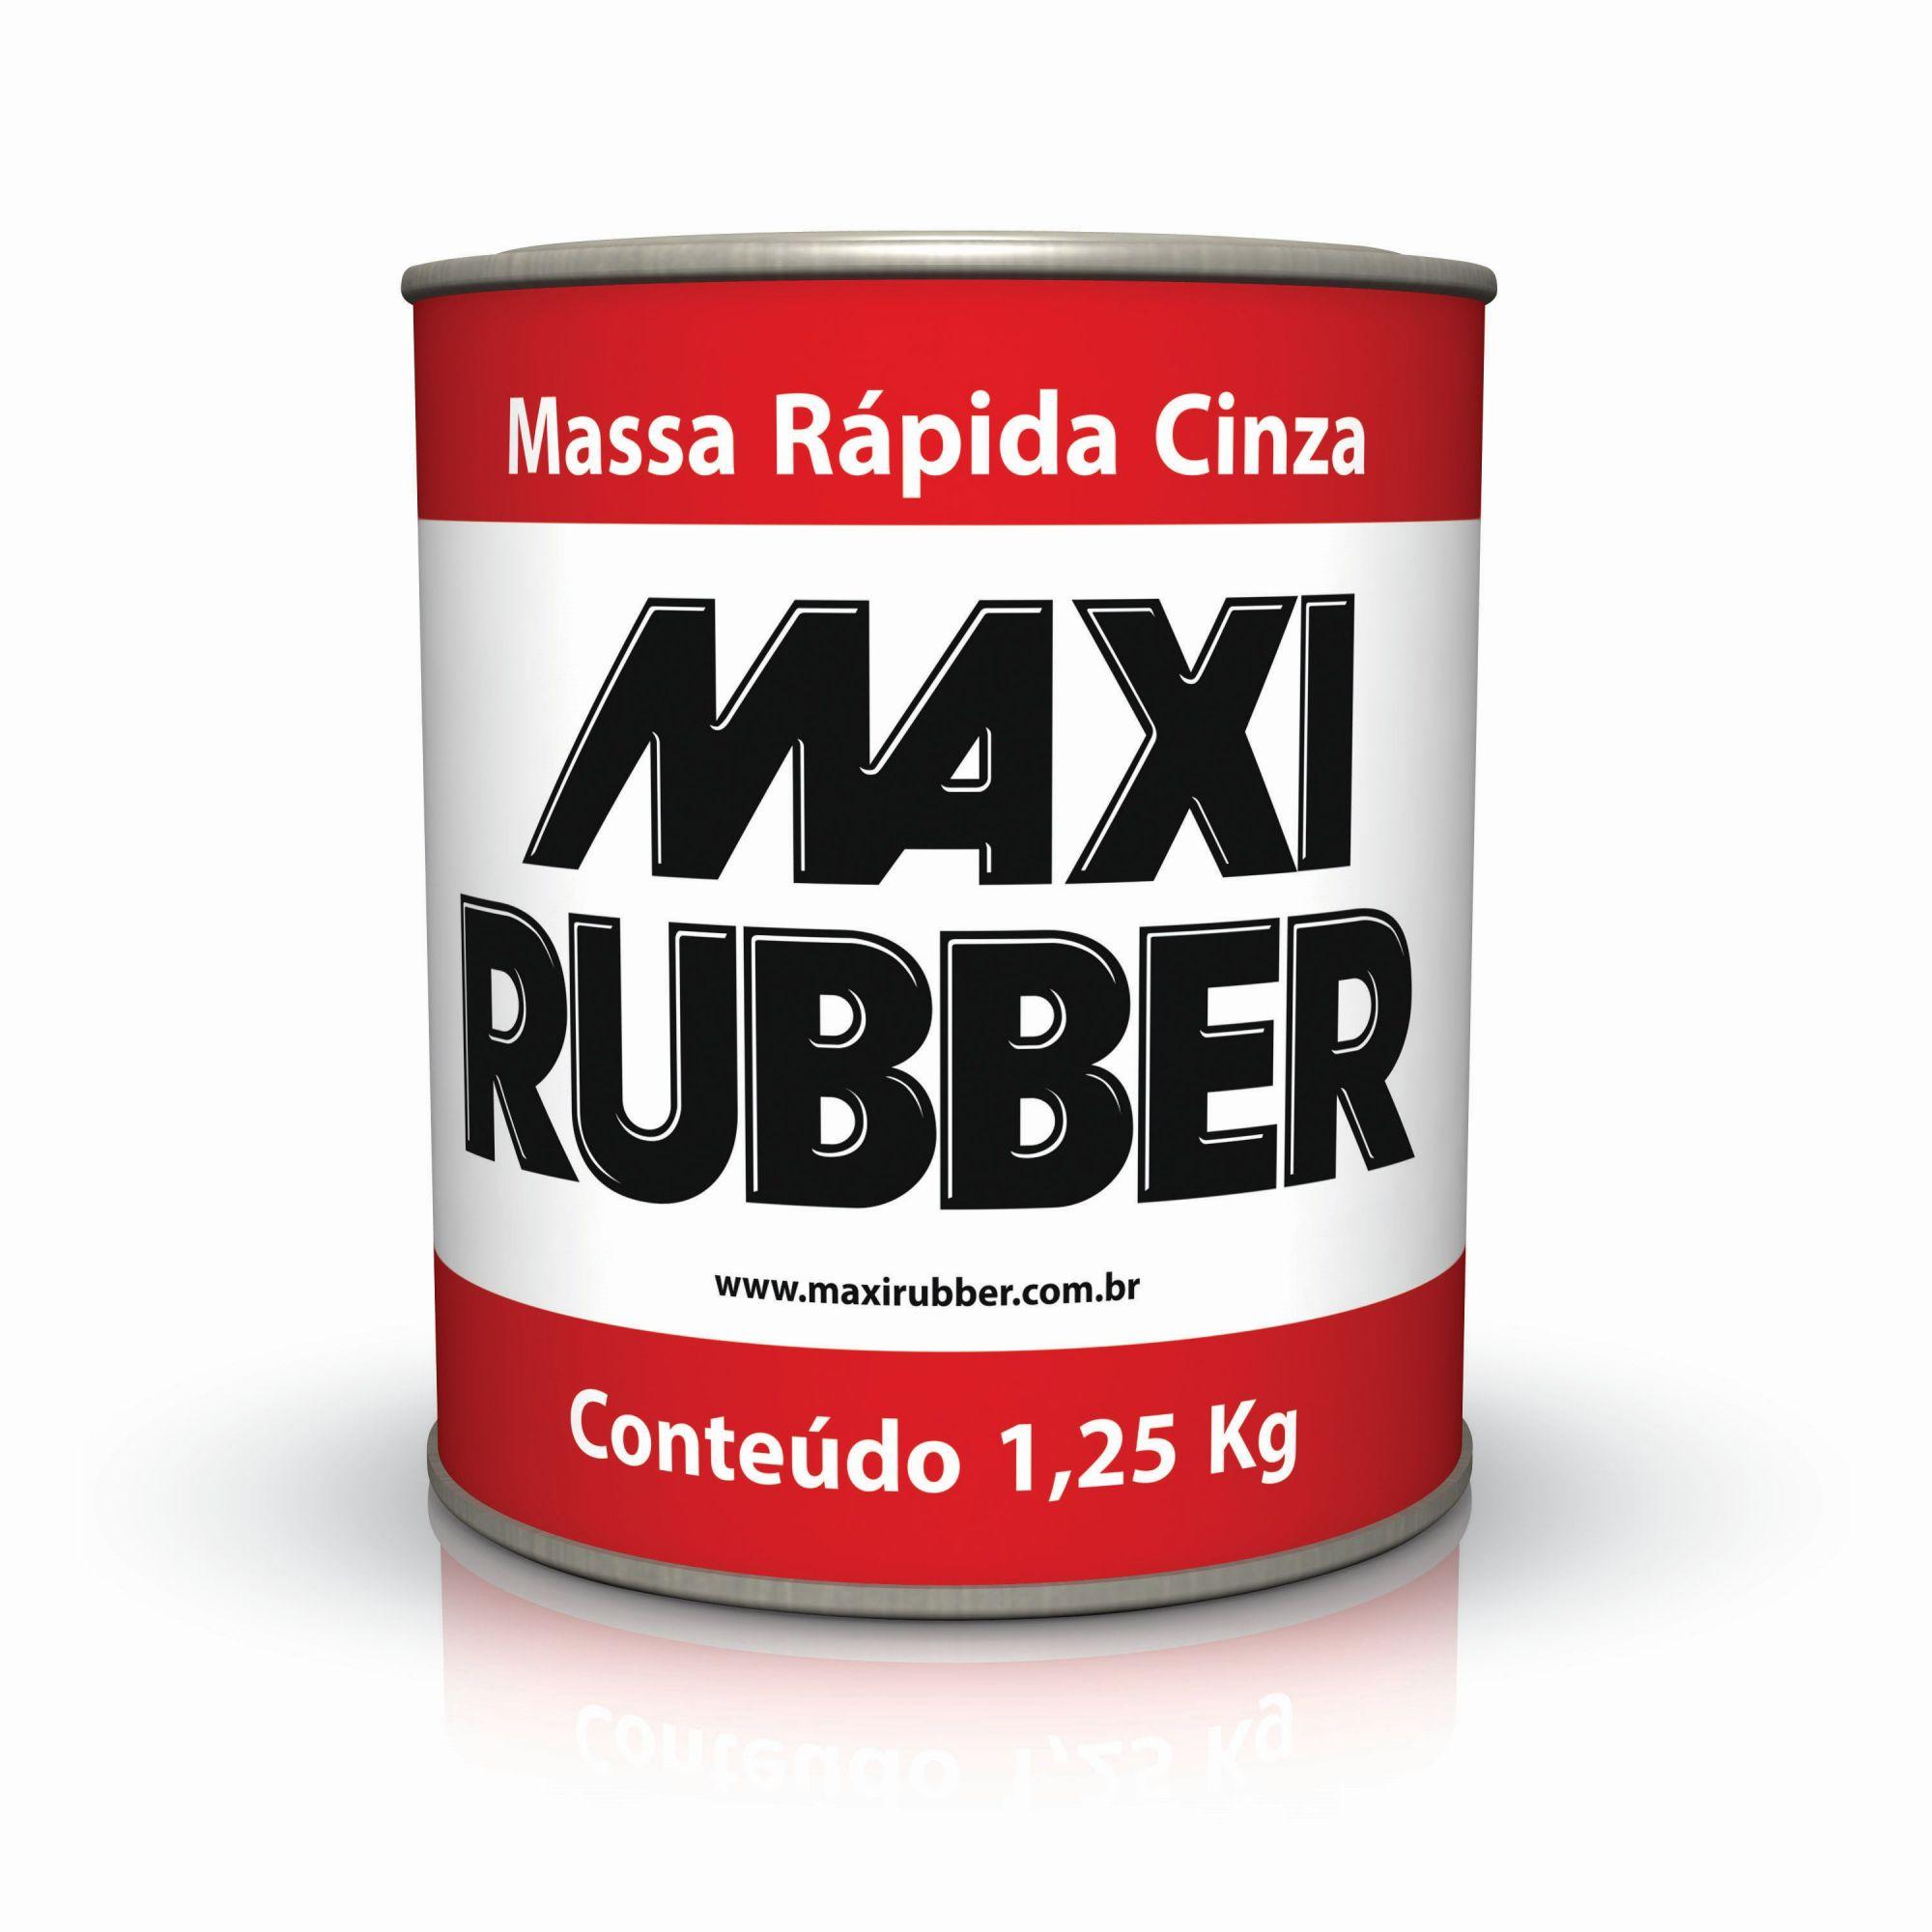 Massa Rápida Cinza - Maxi Rubber